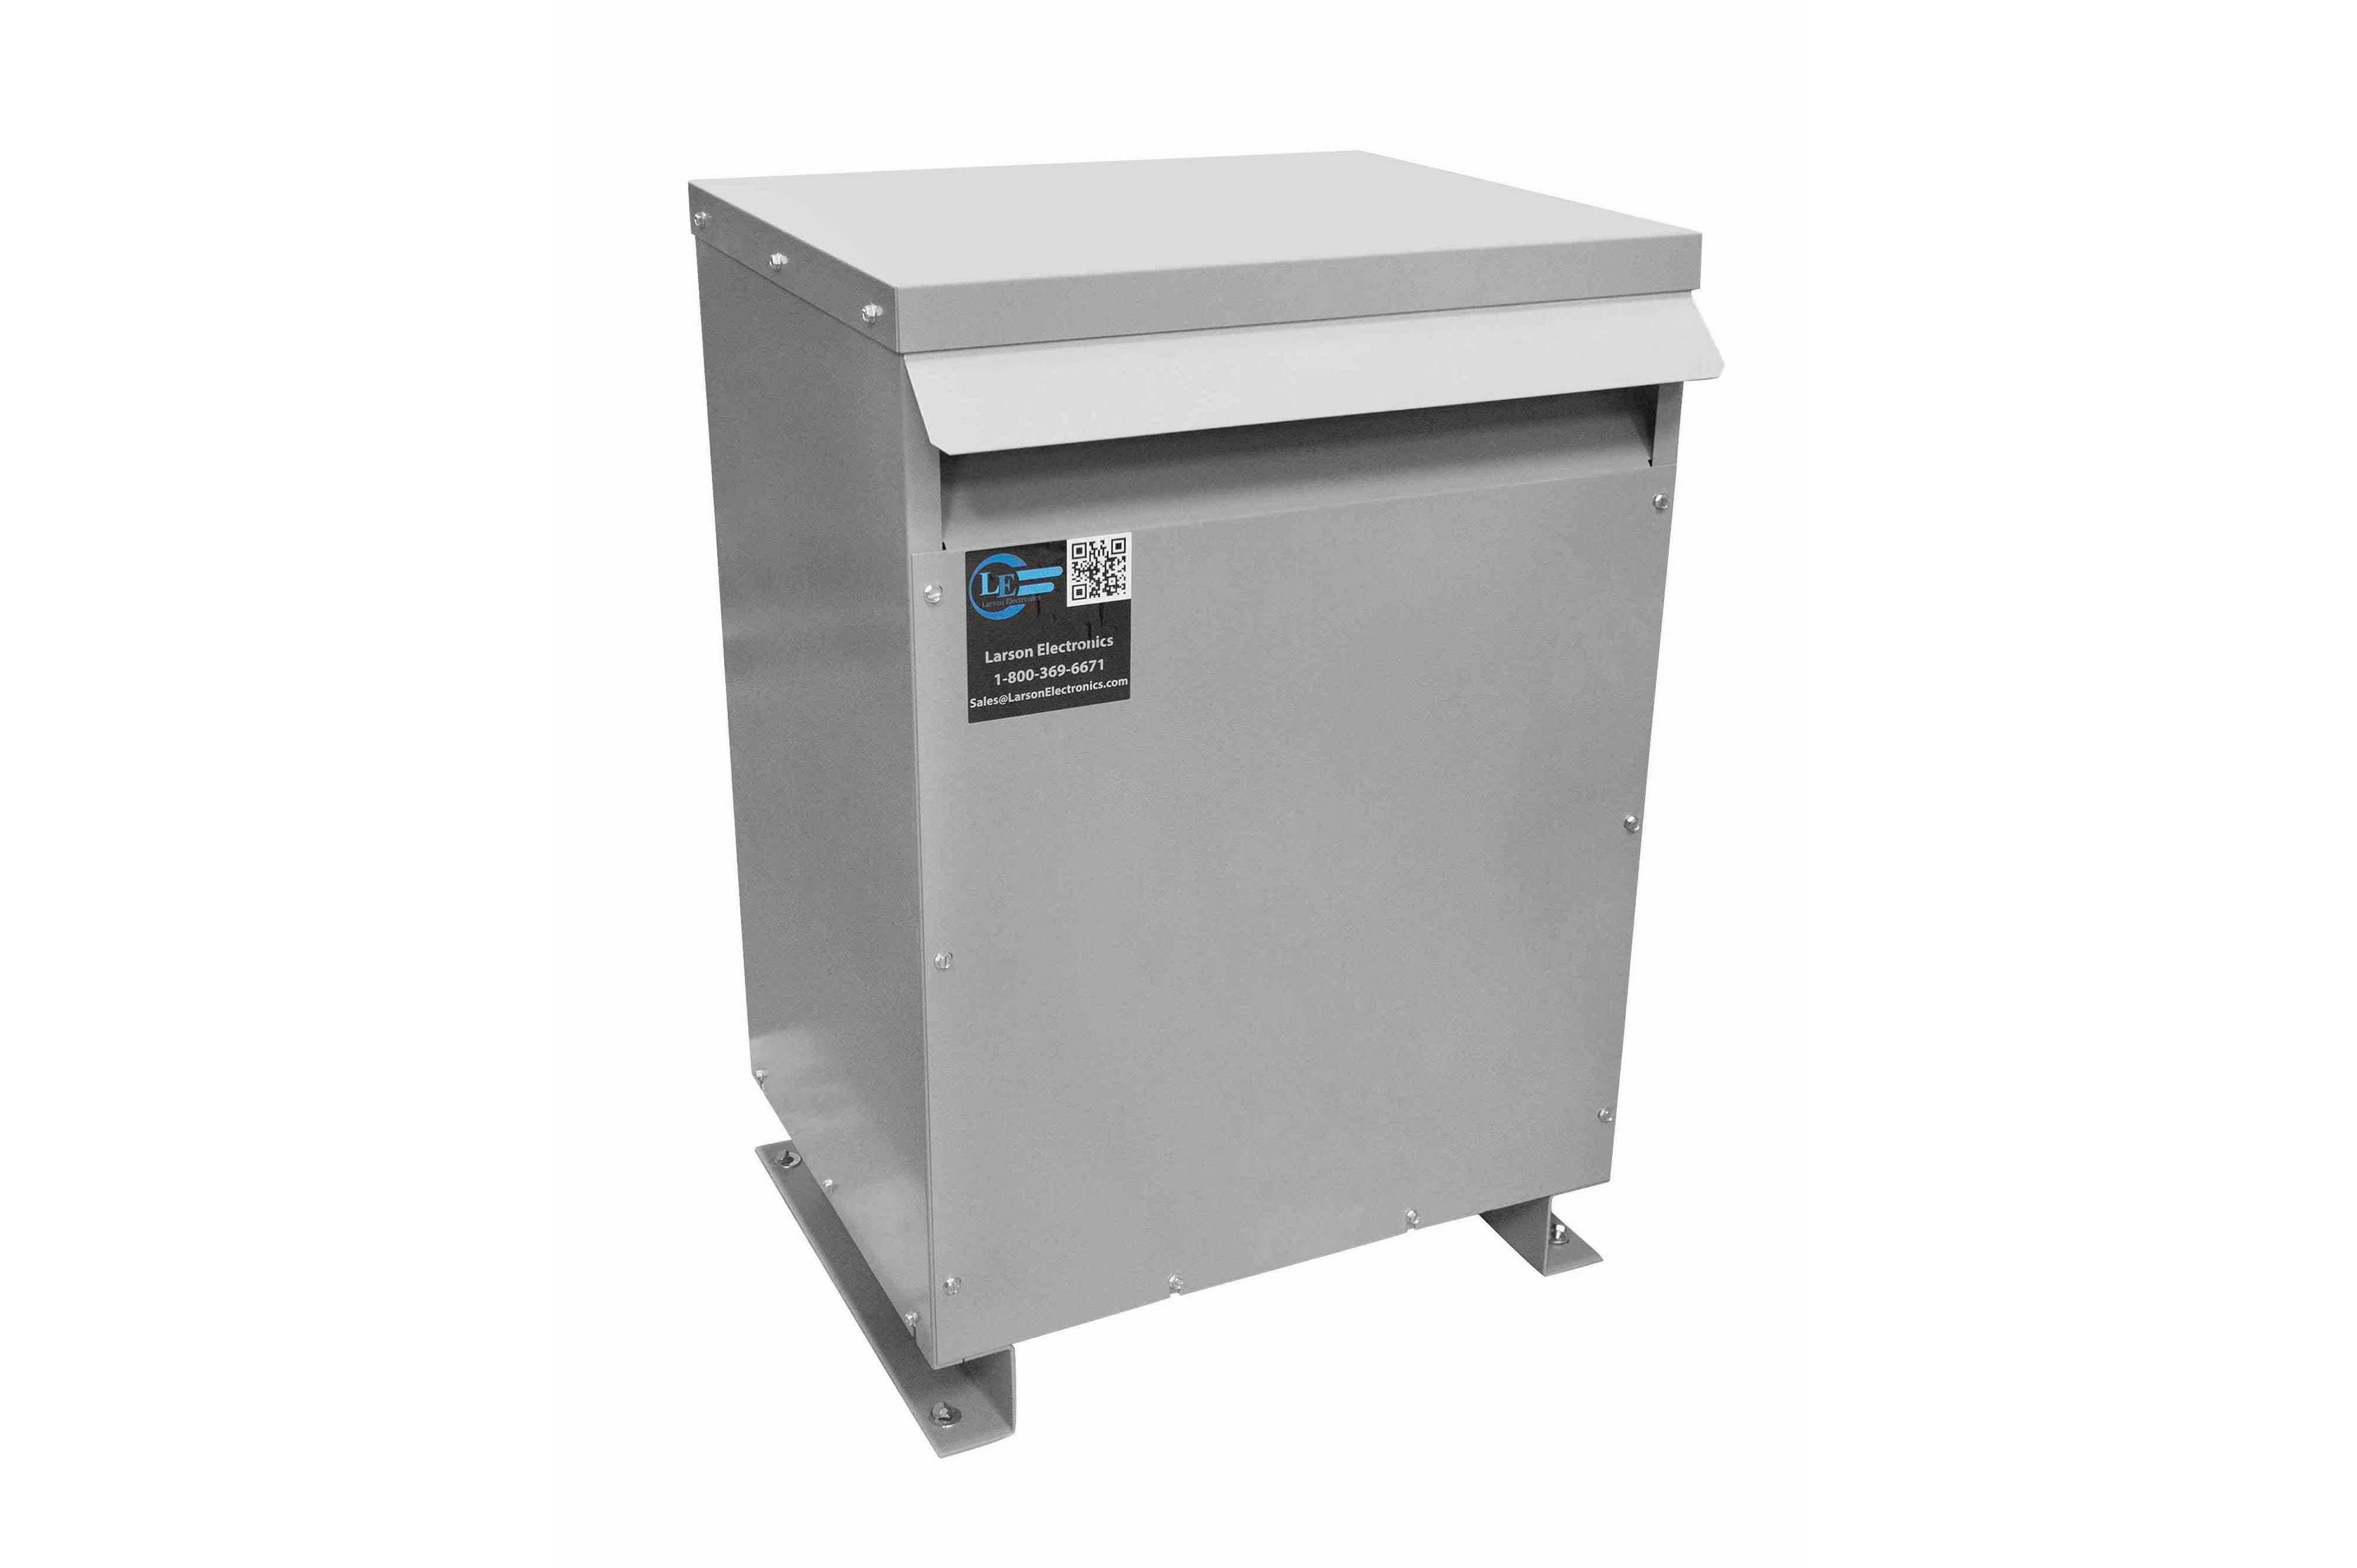 26 kVA 3PH Isolation Transformer, 240V Wye Primary, 208Y/120 Wye-N Secondary, N3R, Ventilated, 60 Hz